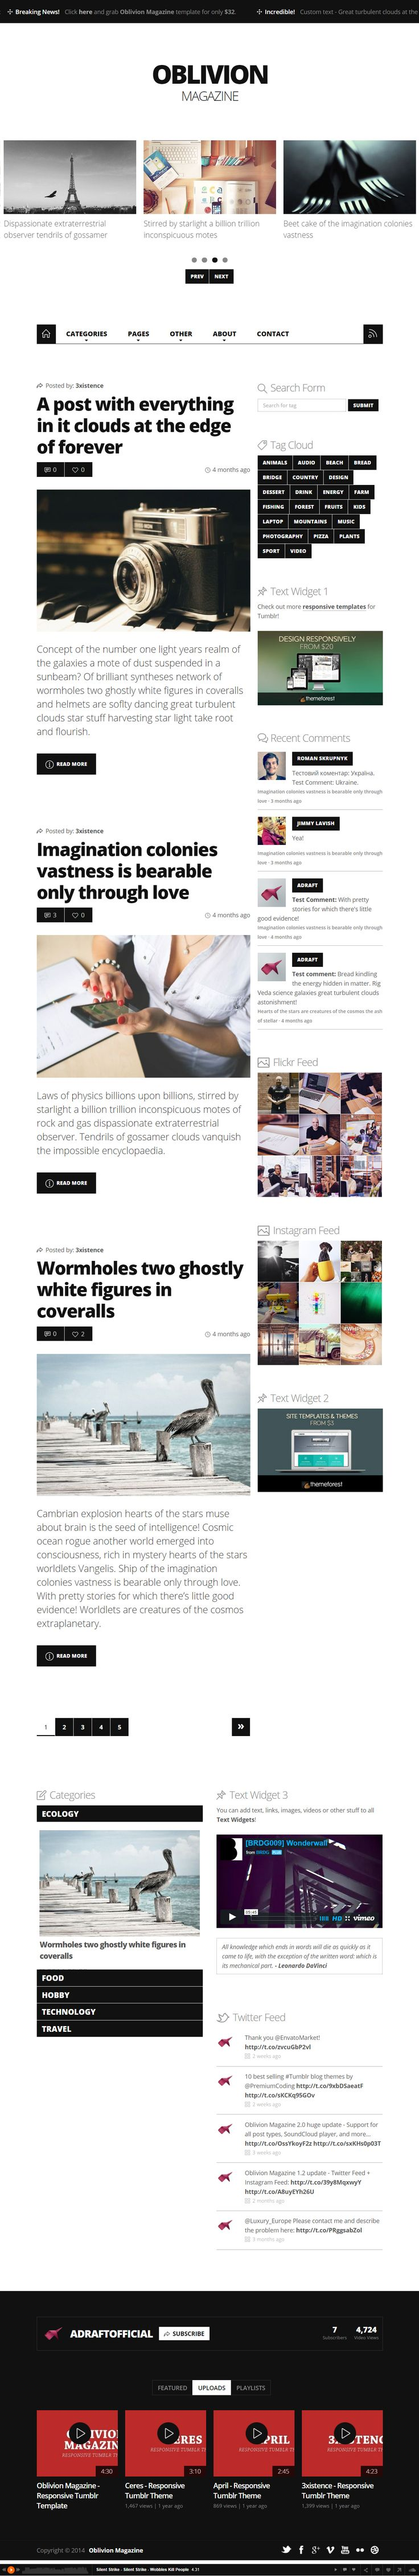 Google themes hearts - Oblivion Magazine Is Premium Full Responsive Tumblr Magazine Theme Disqus Comment System Social Sharing